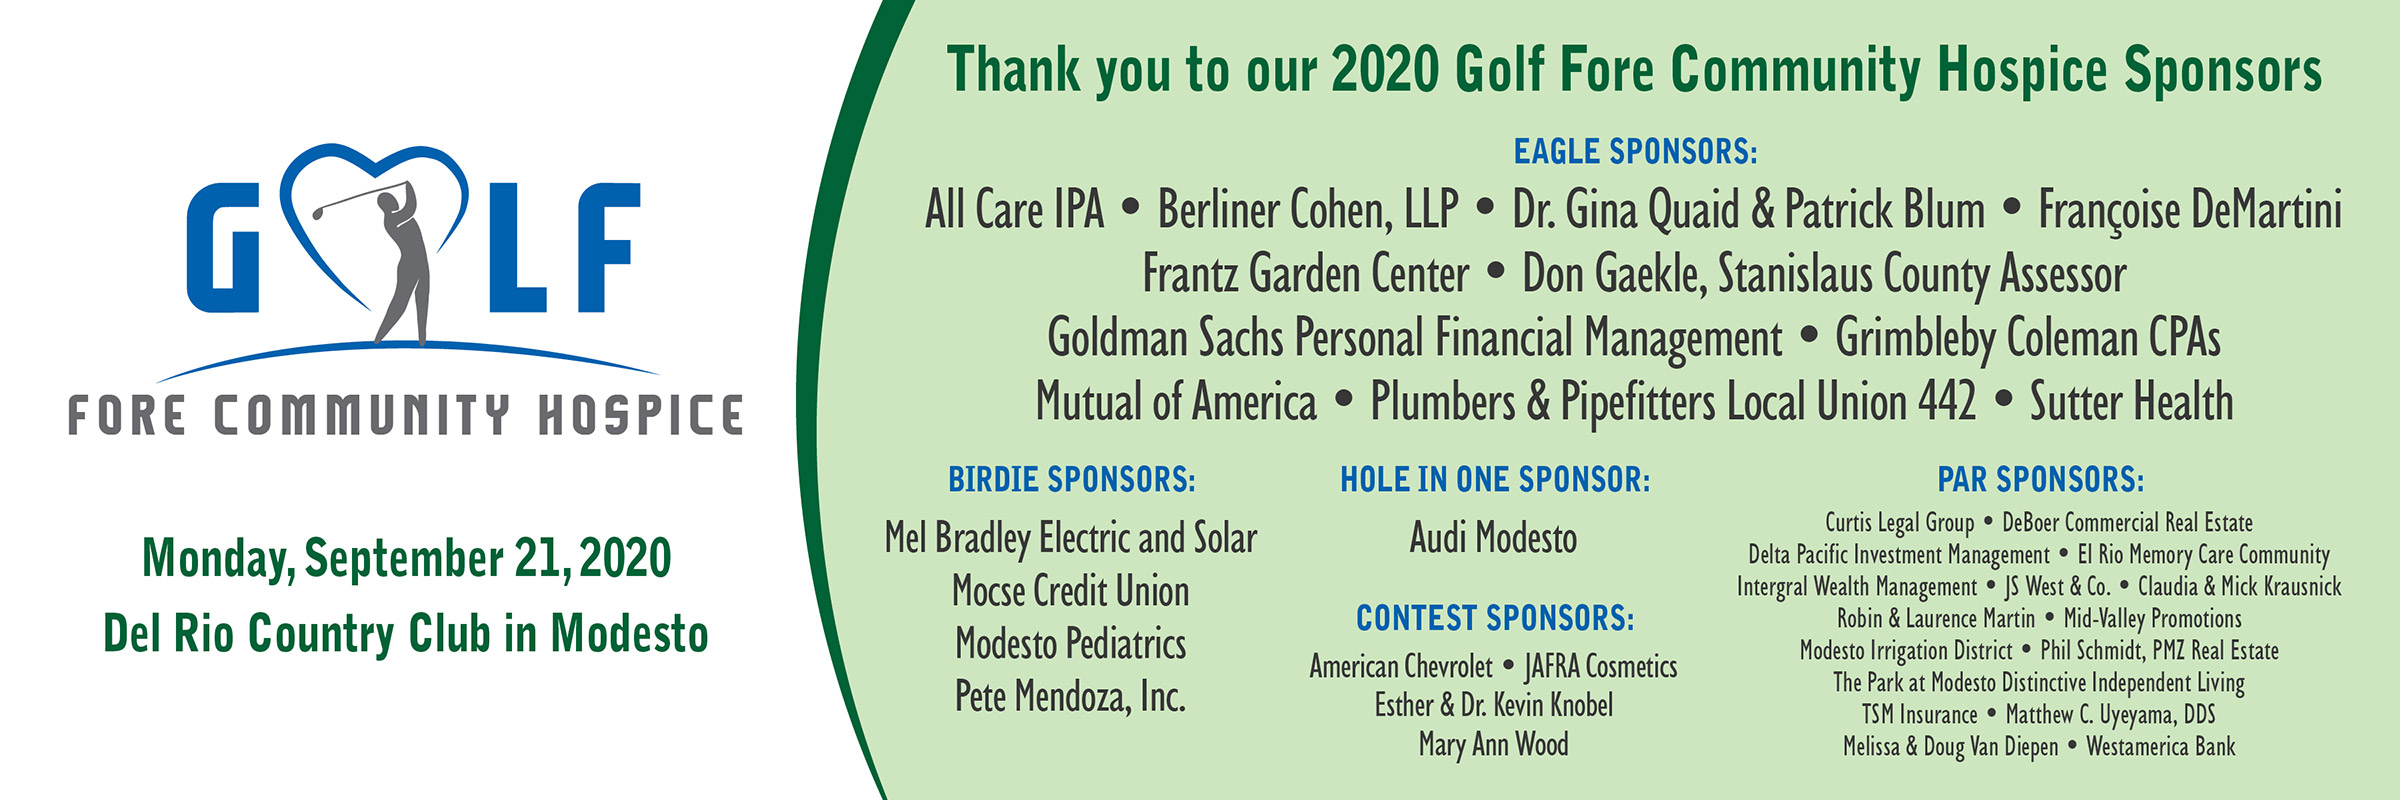 3New Golf-Sponsors-Thank-You_Carousel